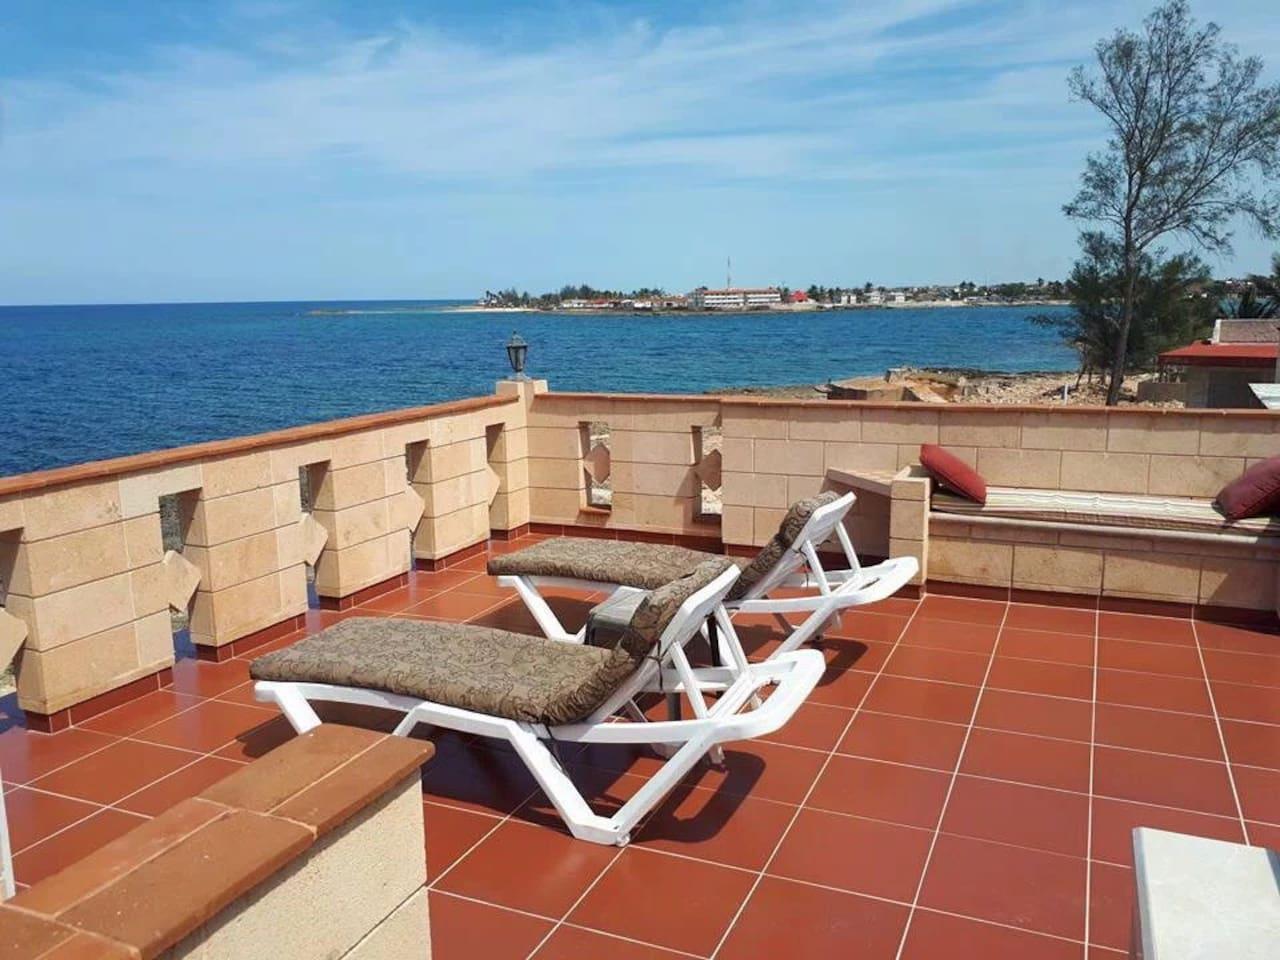 Apartment Casa Oceanview 1 - Luxury   Amazing View photo 25604964